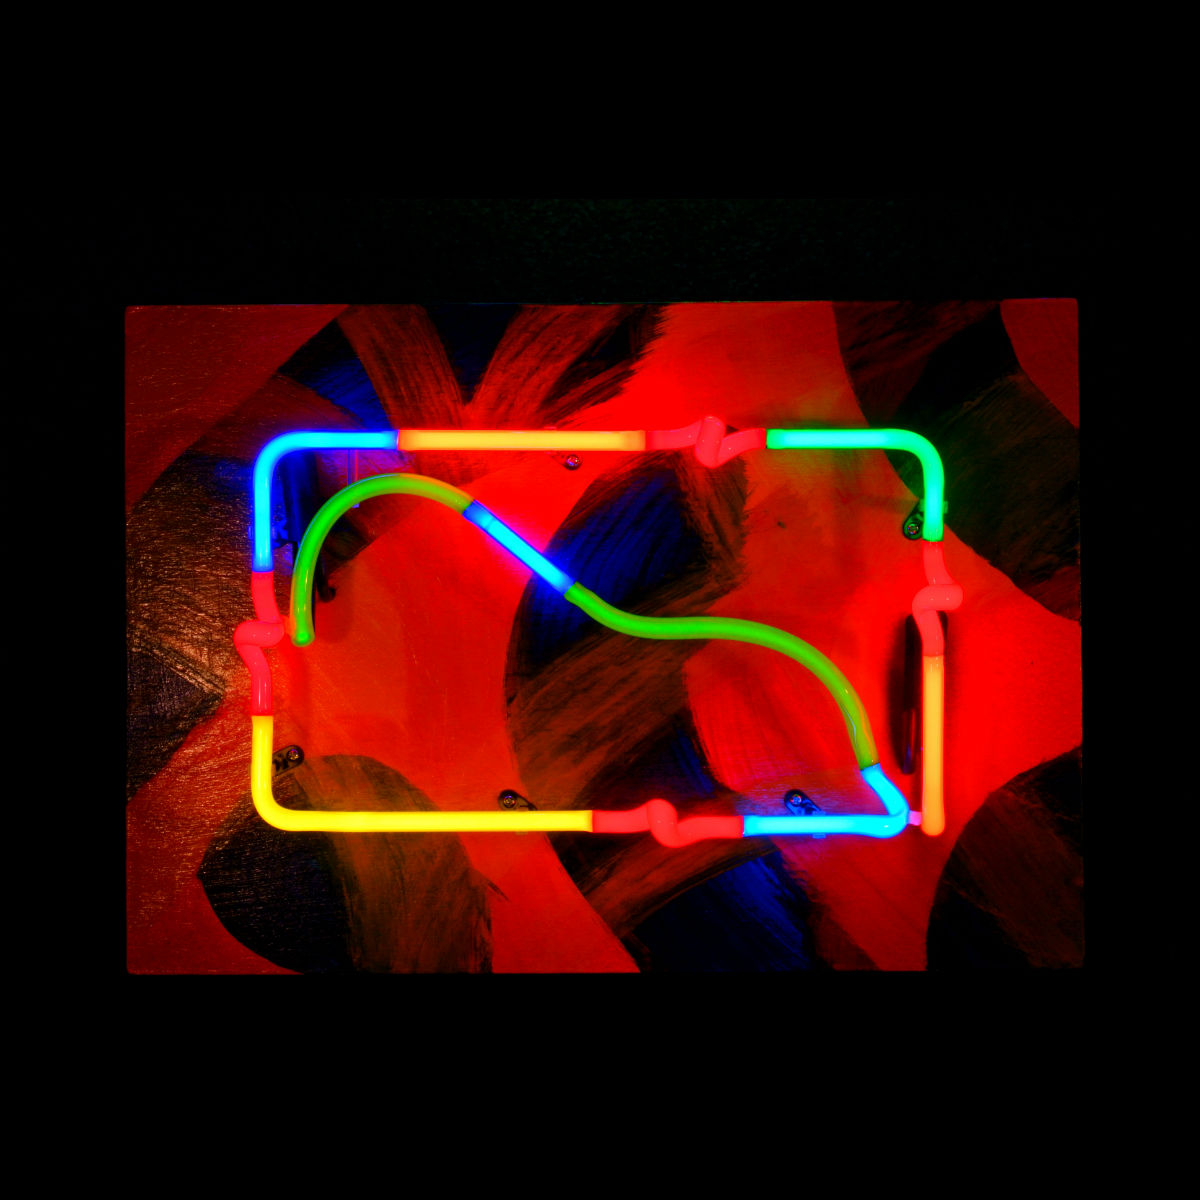 """Rainforest With Red Frogs"" Designer Neon Light Sculpture by John Barton - BartonNeonMagic.com"